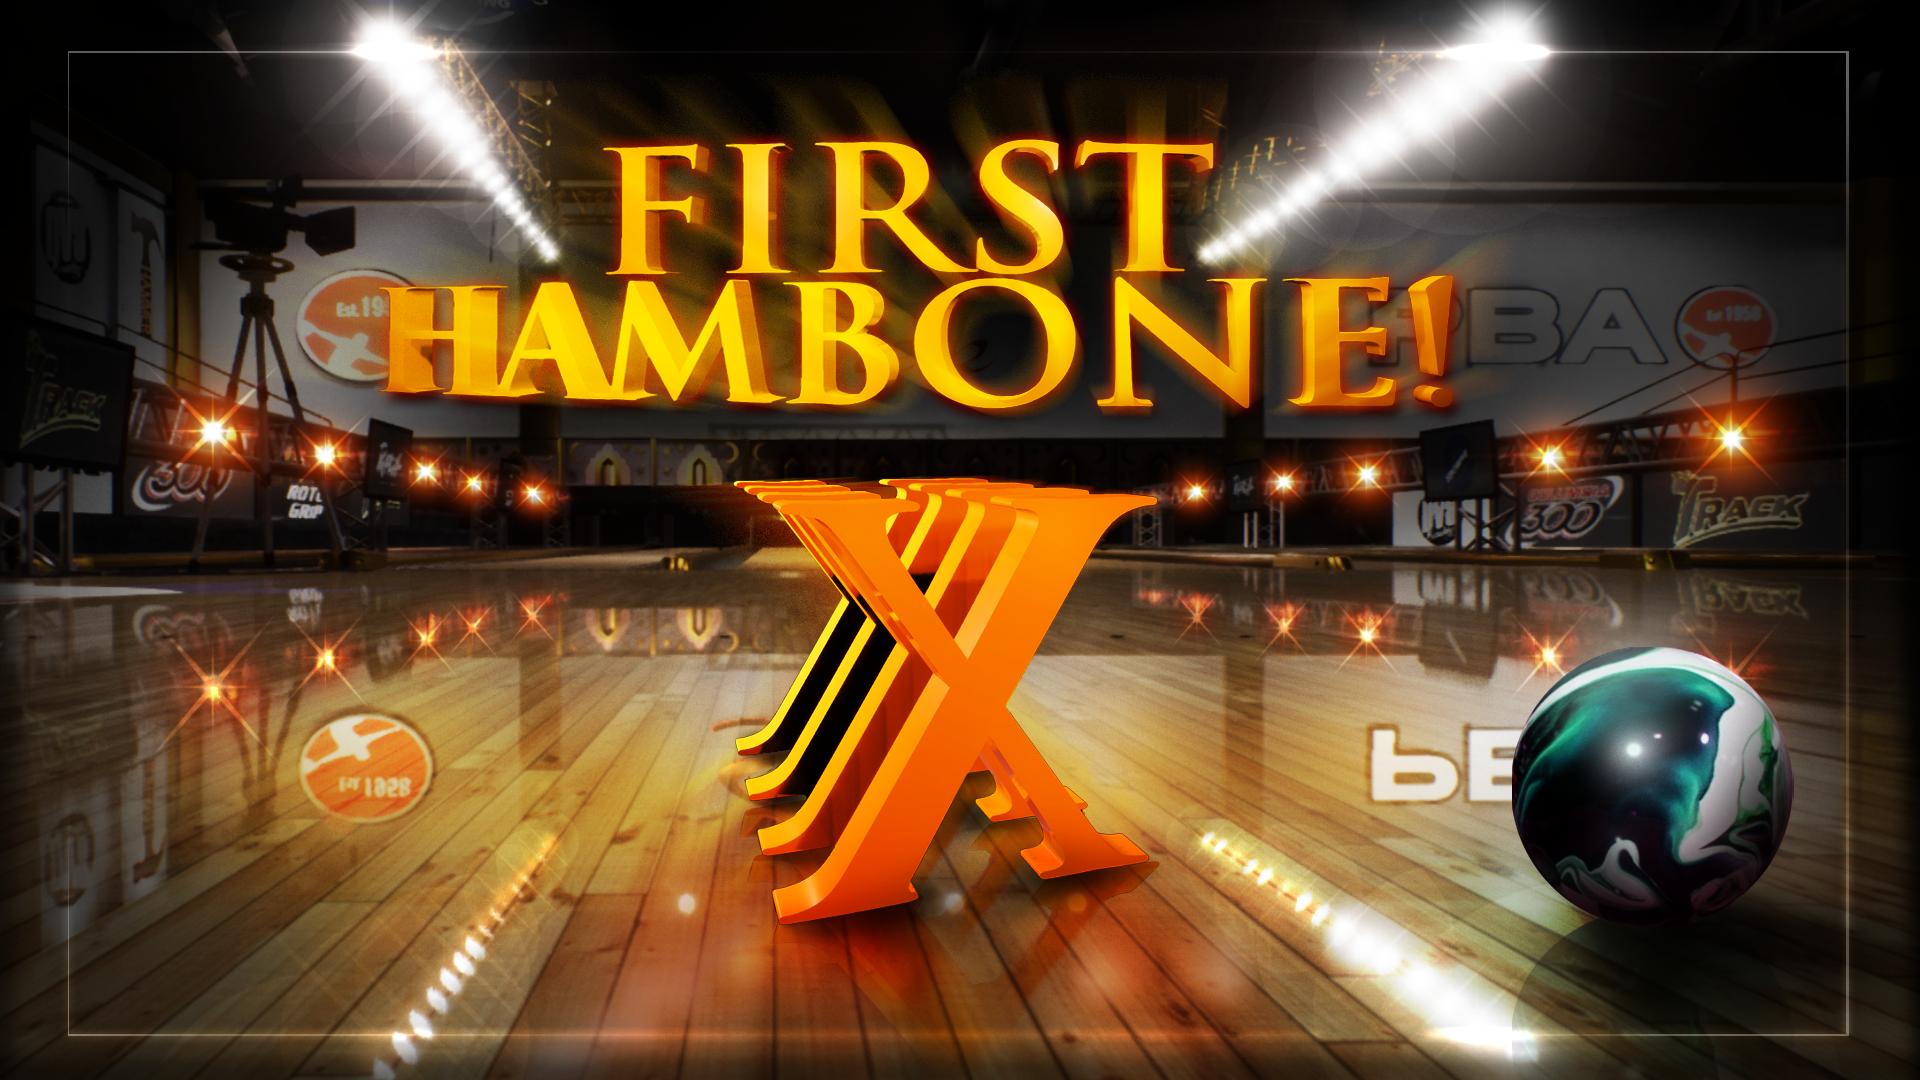 First Hambone